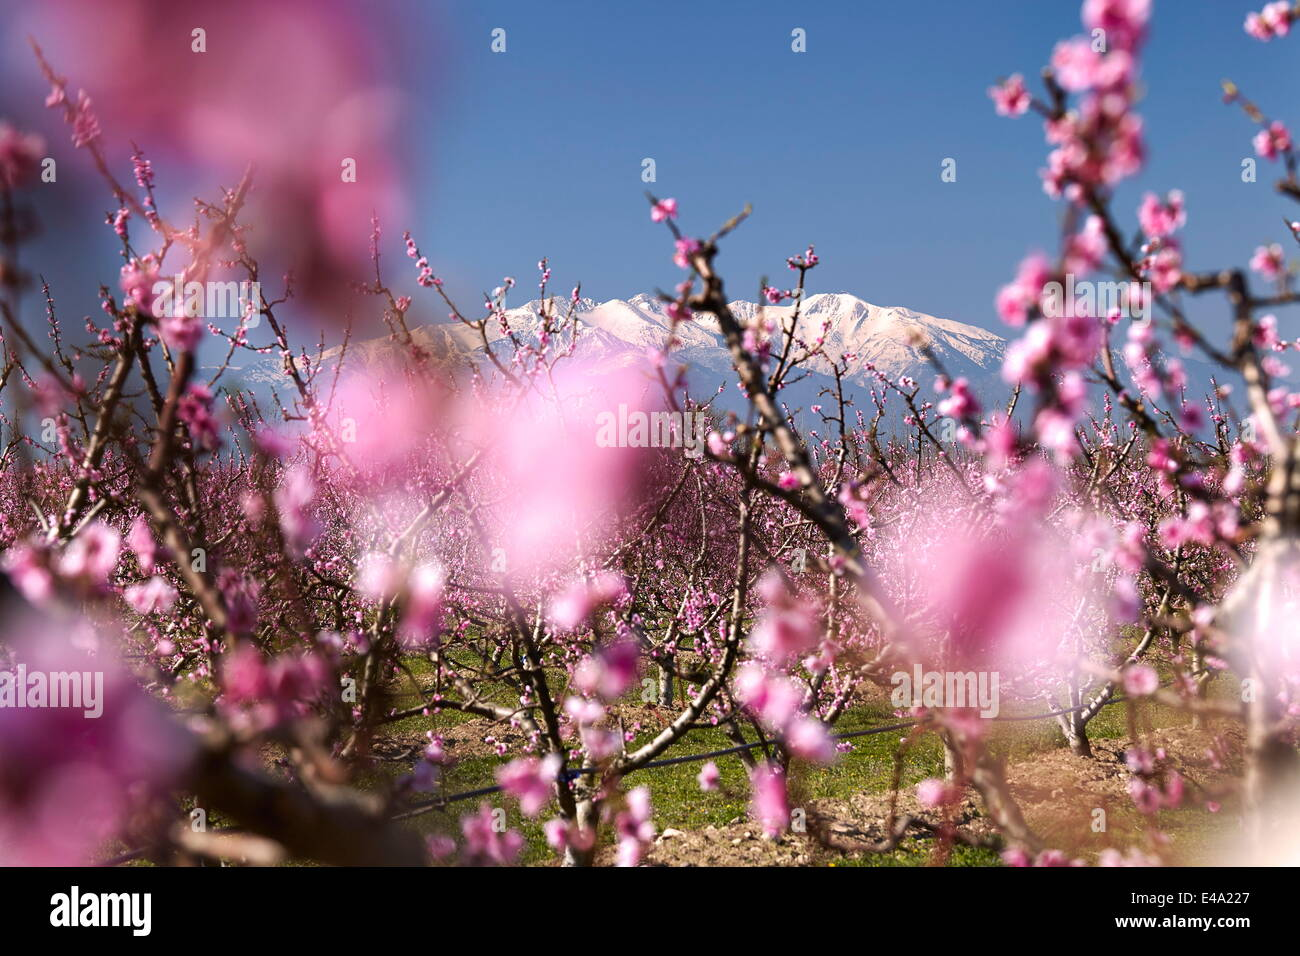 Fruit blossom, Mount Canigou, Pyrenees Oriental, Languedoc-Roussillon, France, Europe - Stock Image